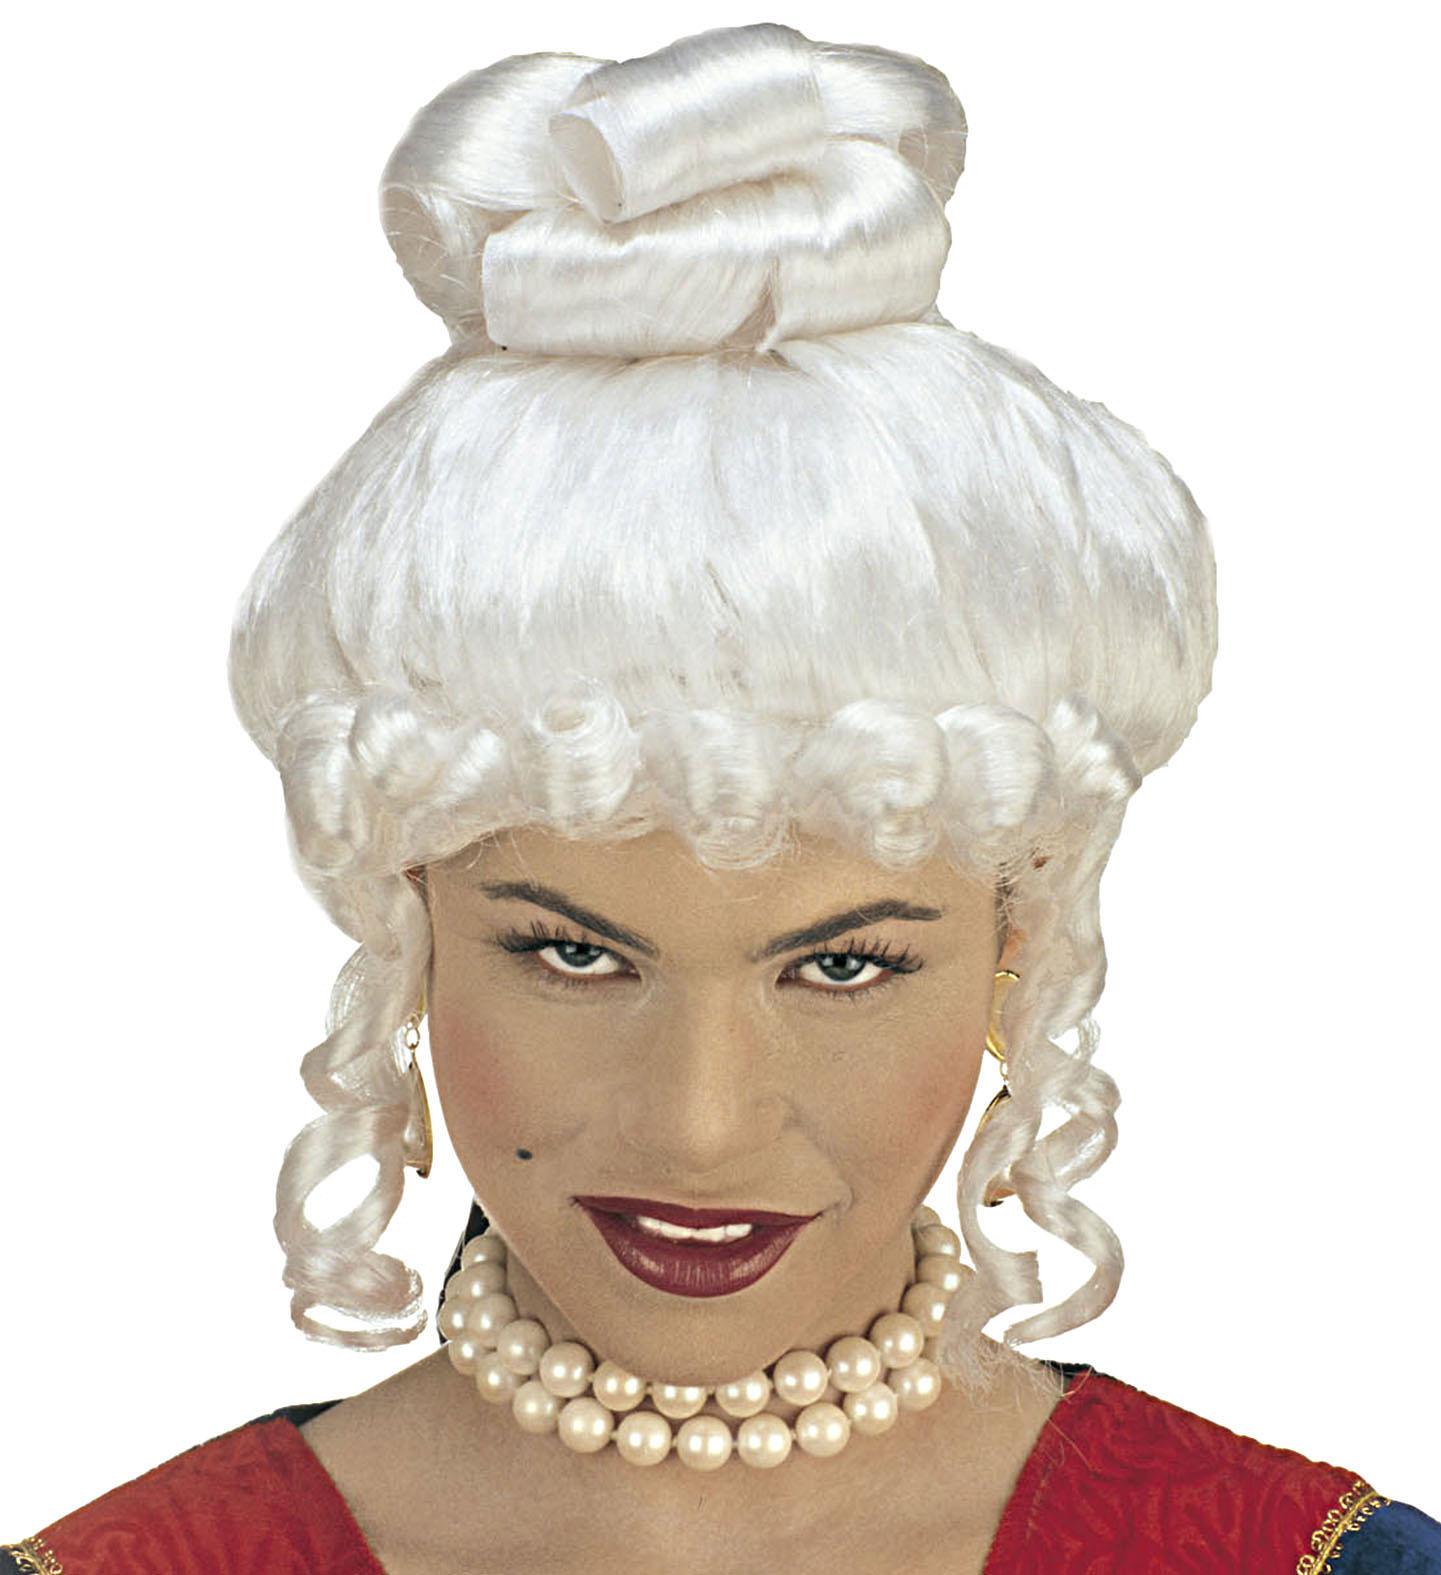 Countess Jolanda Wig Fancy Dress